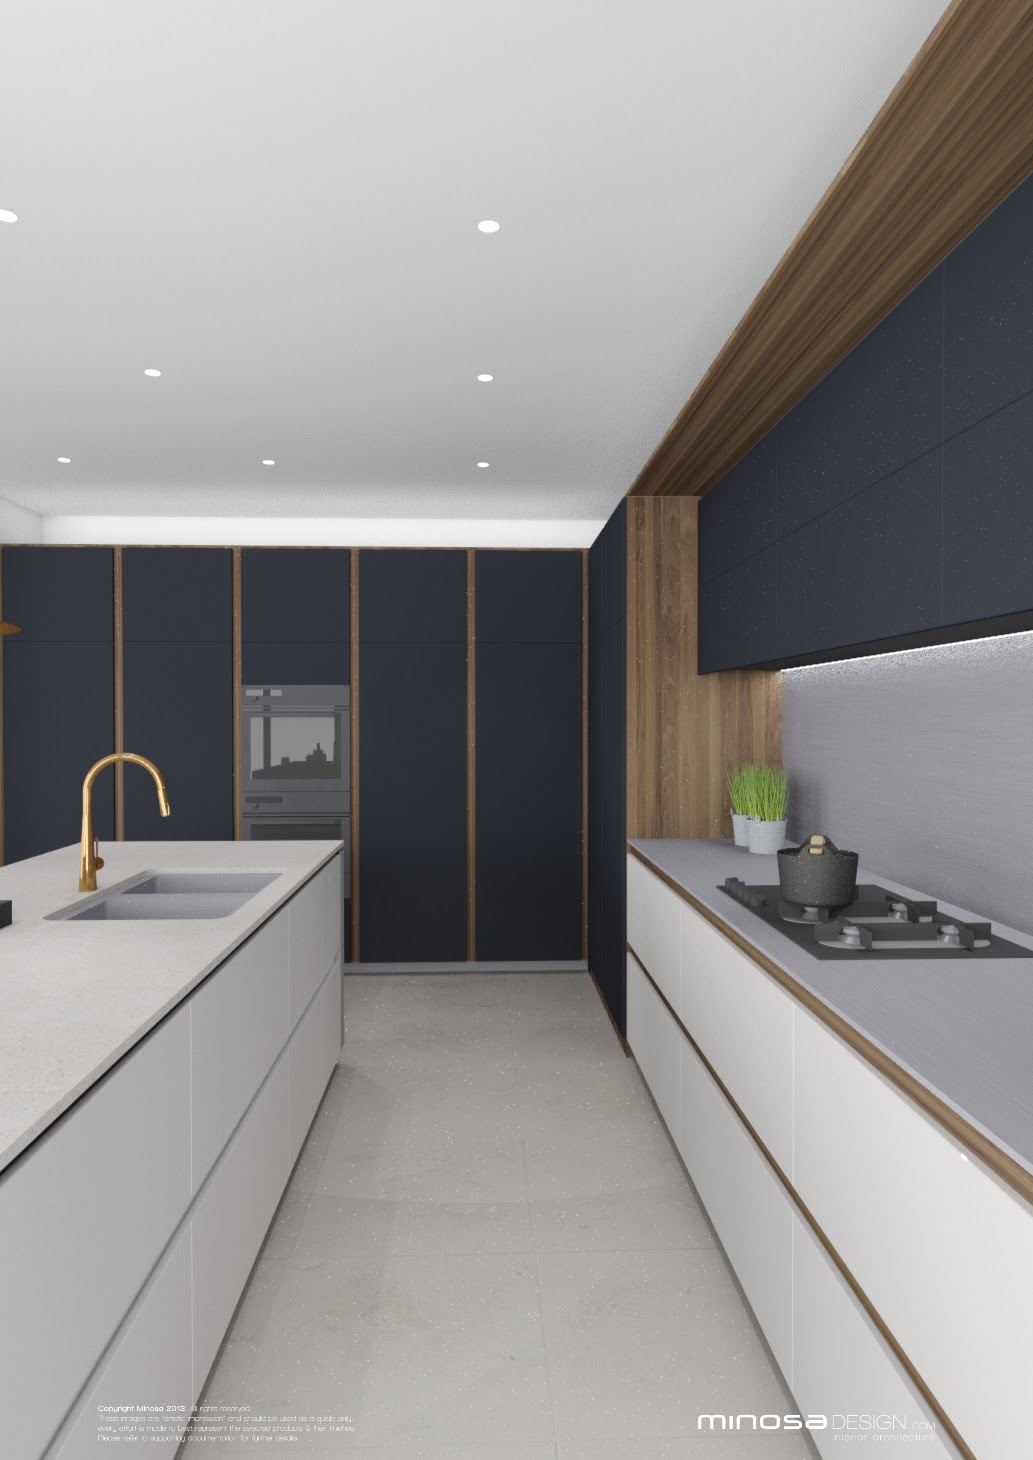 Kitchen Remodeling Design Ideas Inspiration: Minosa: Striking Kitchen Design With Rich Wood & Copper